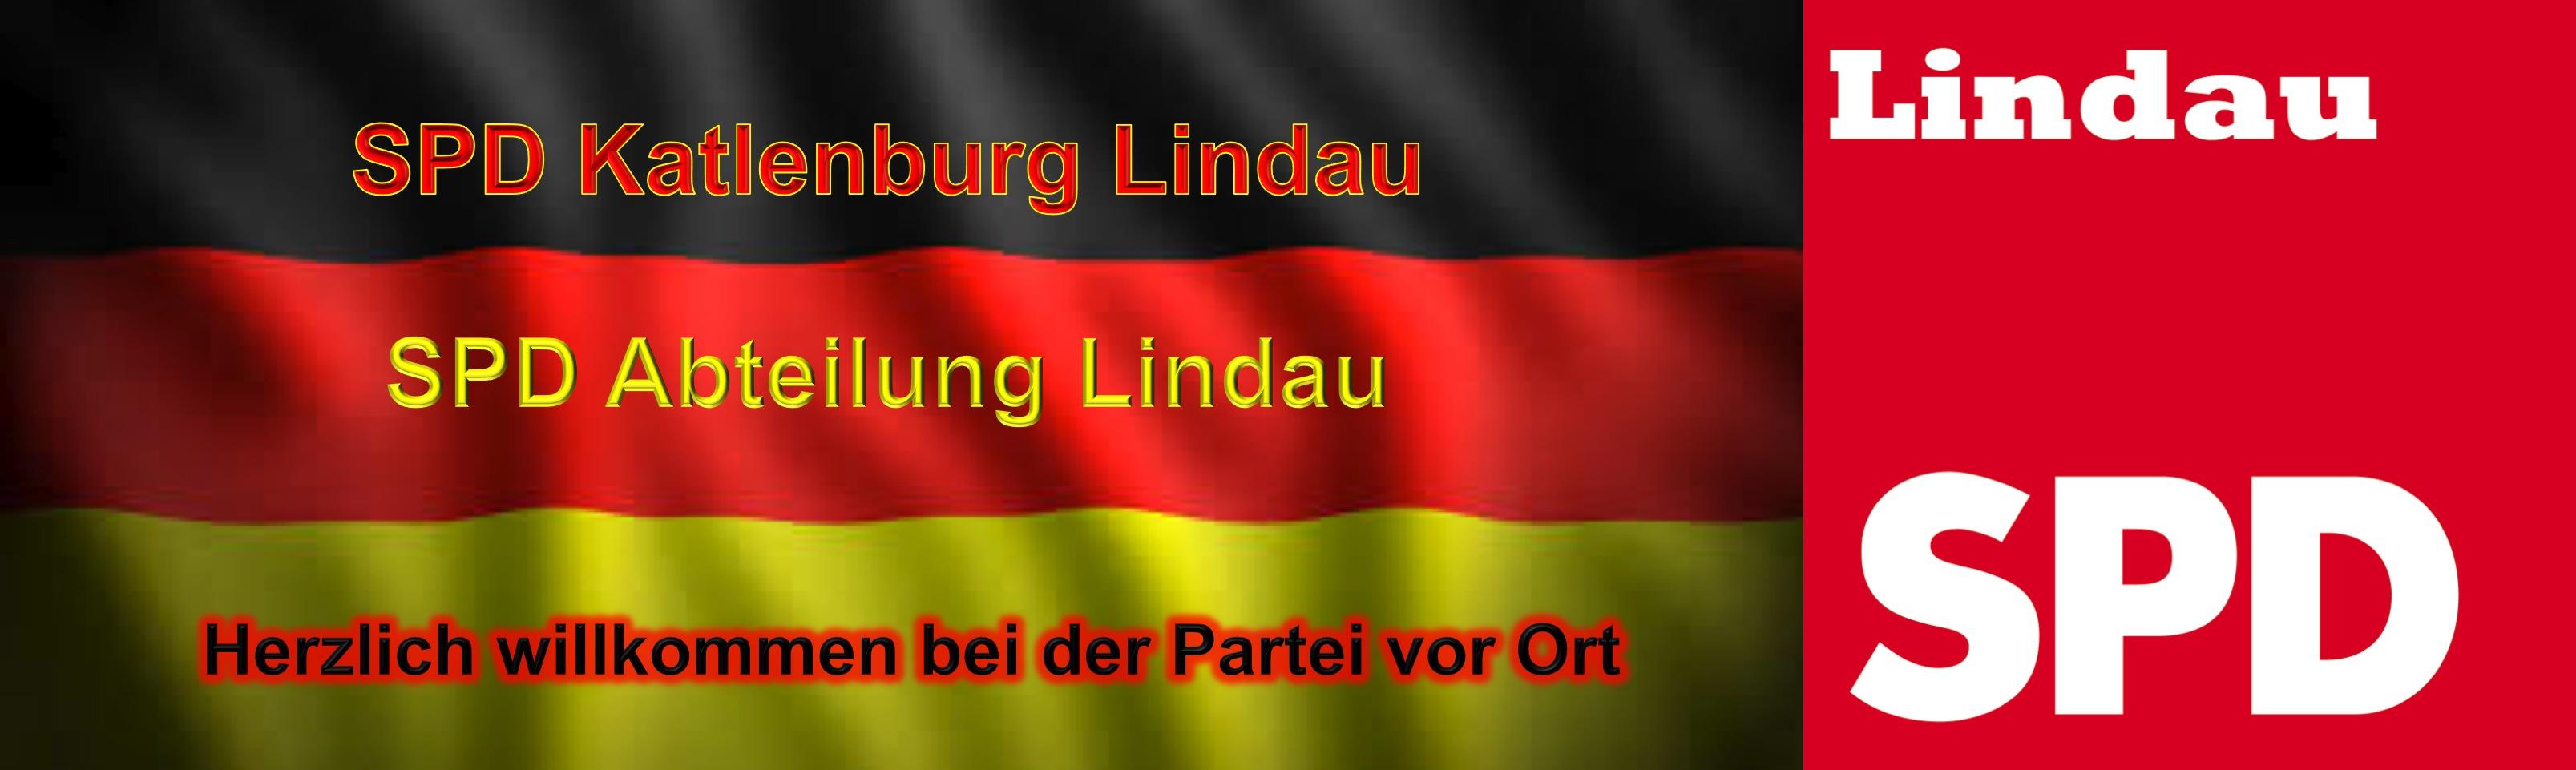 SPD-Lindau/Harz